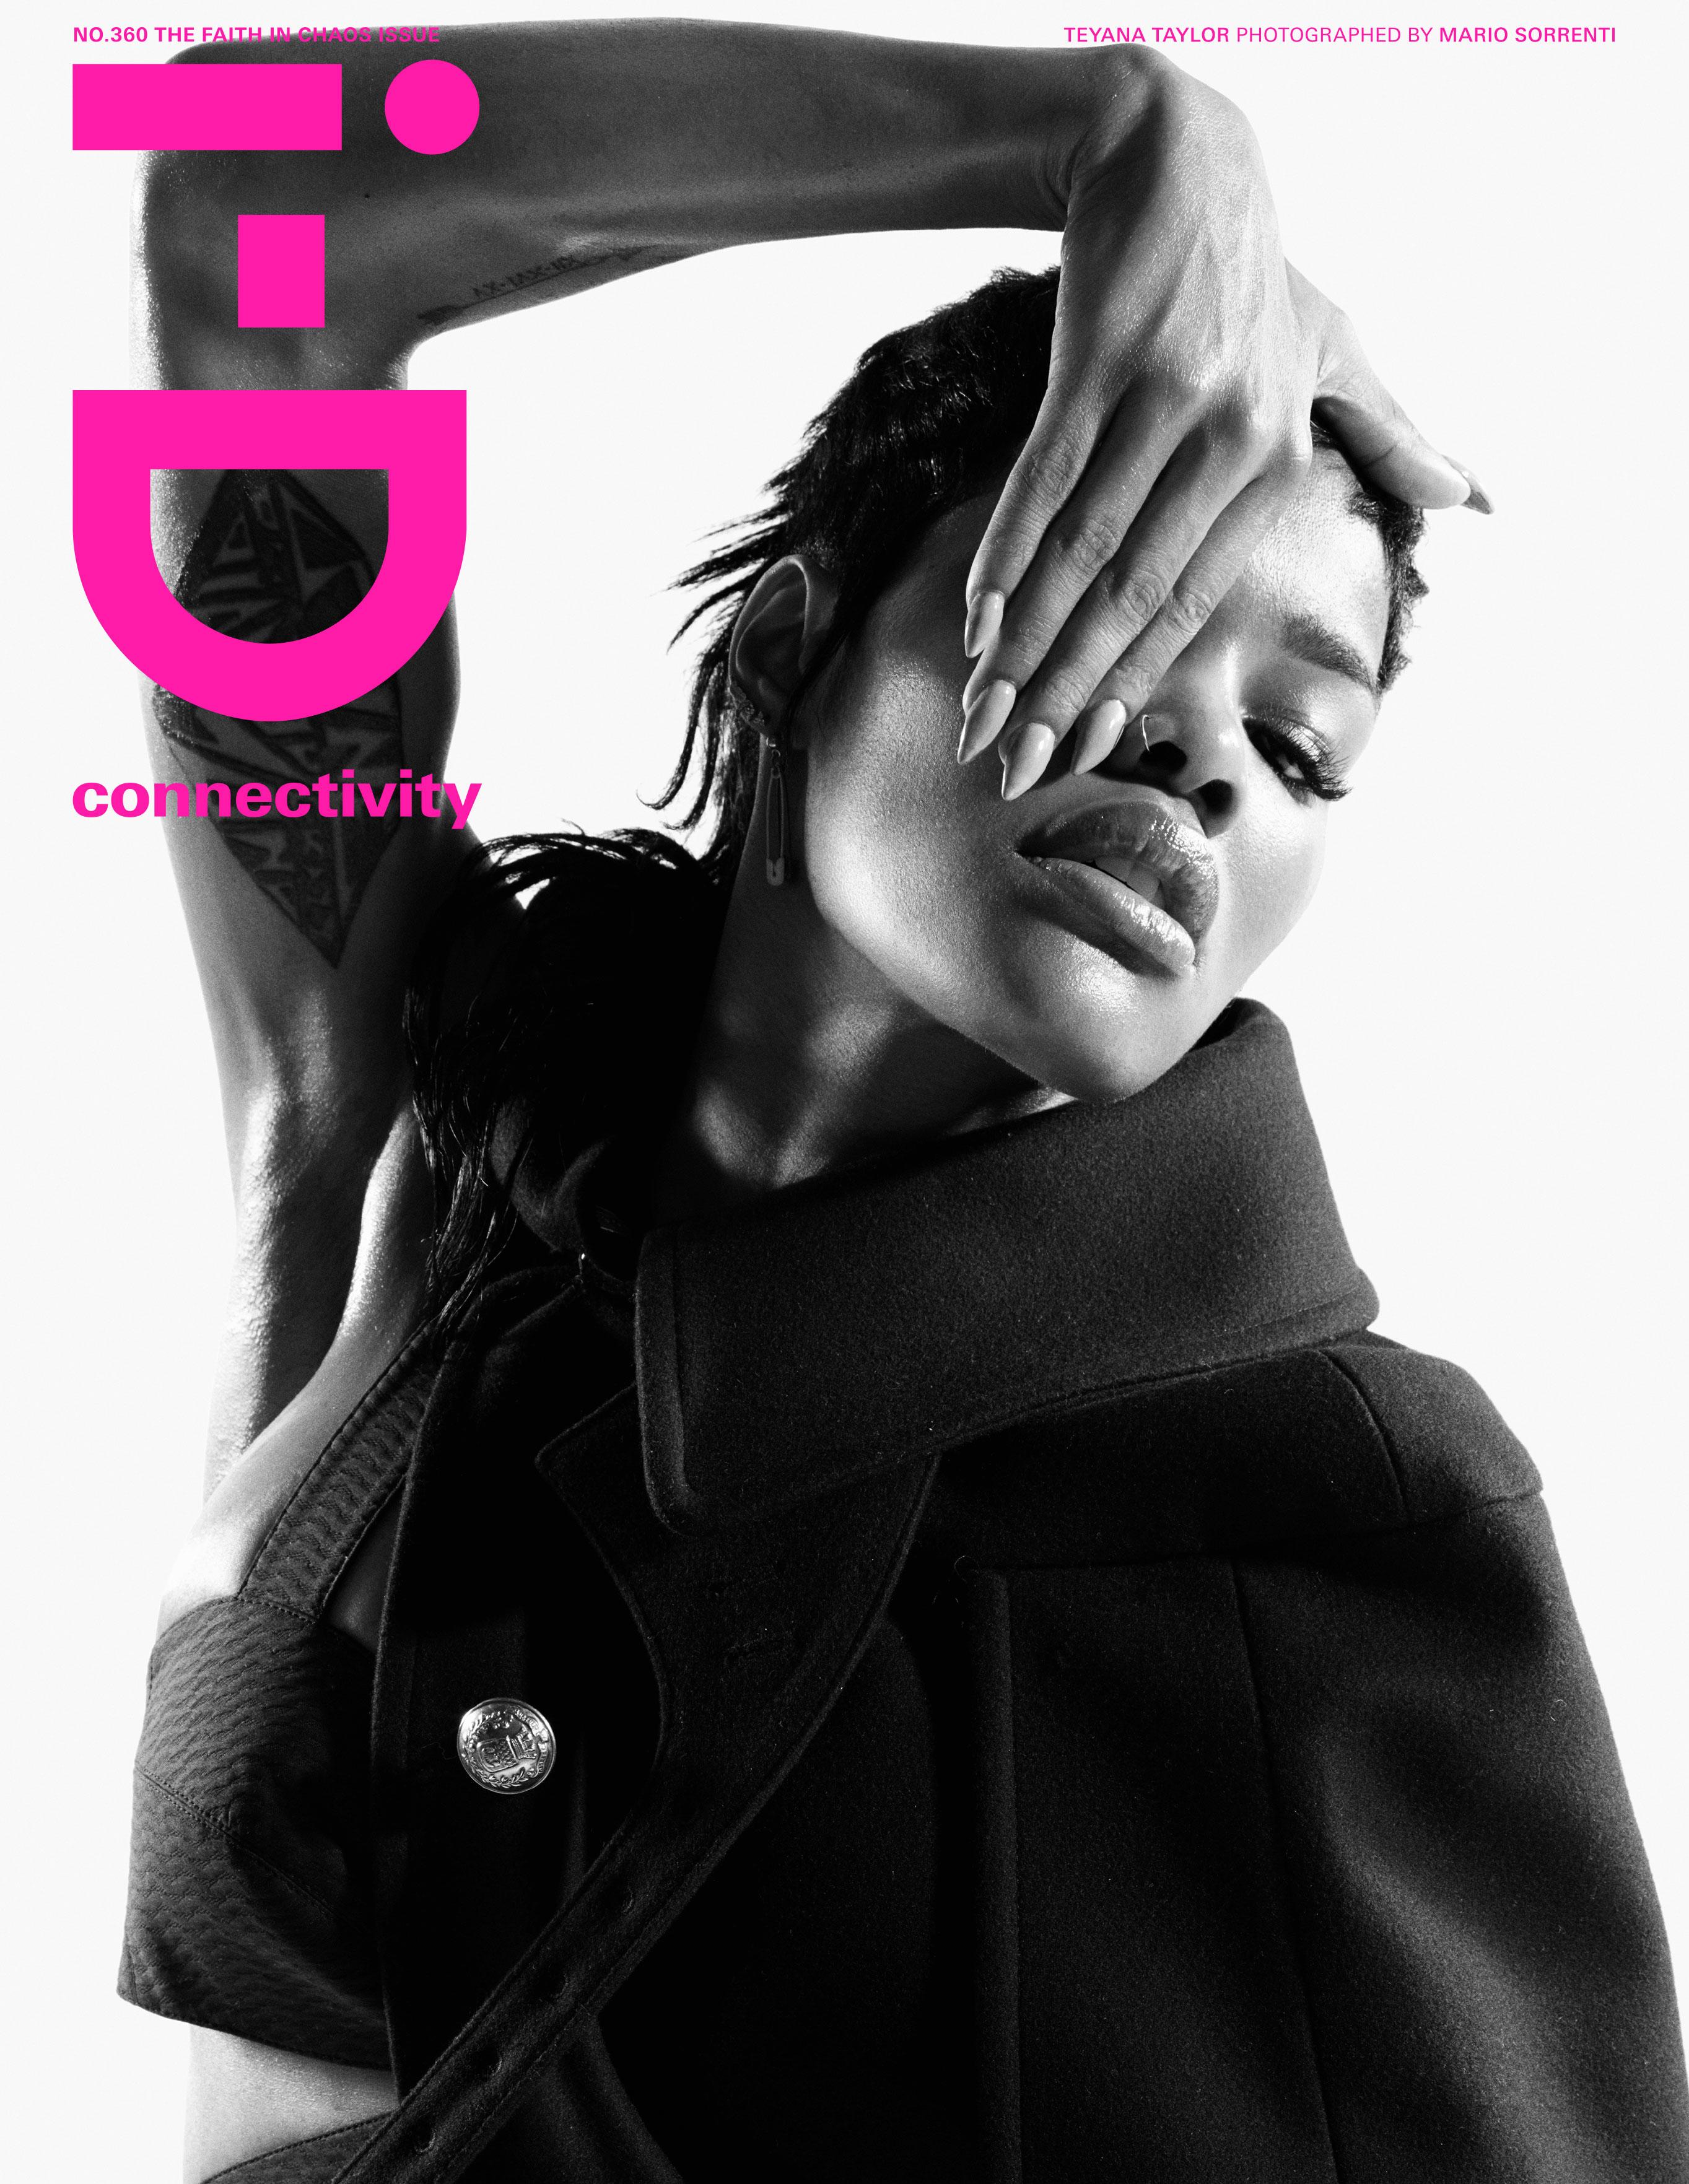 Тейяна Тейлор в хаос-выпуске журнала i-D, лето 2020 / обложка